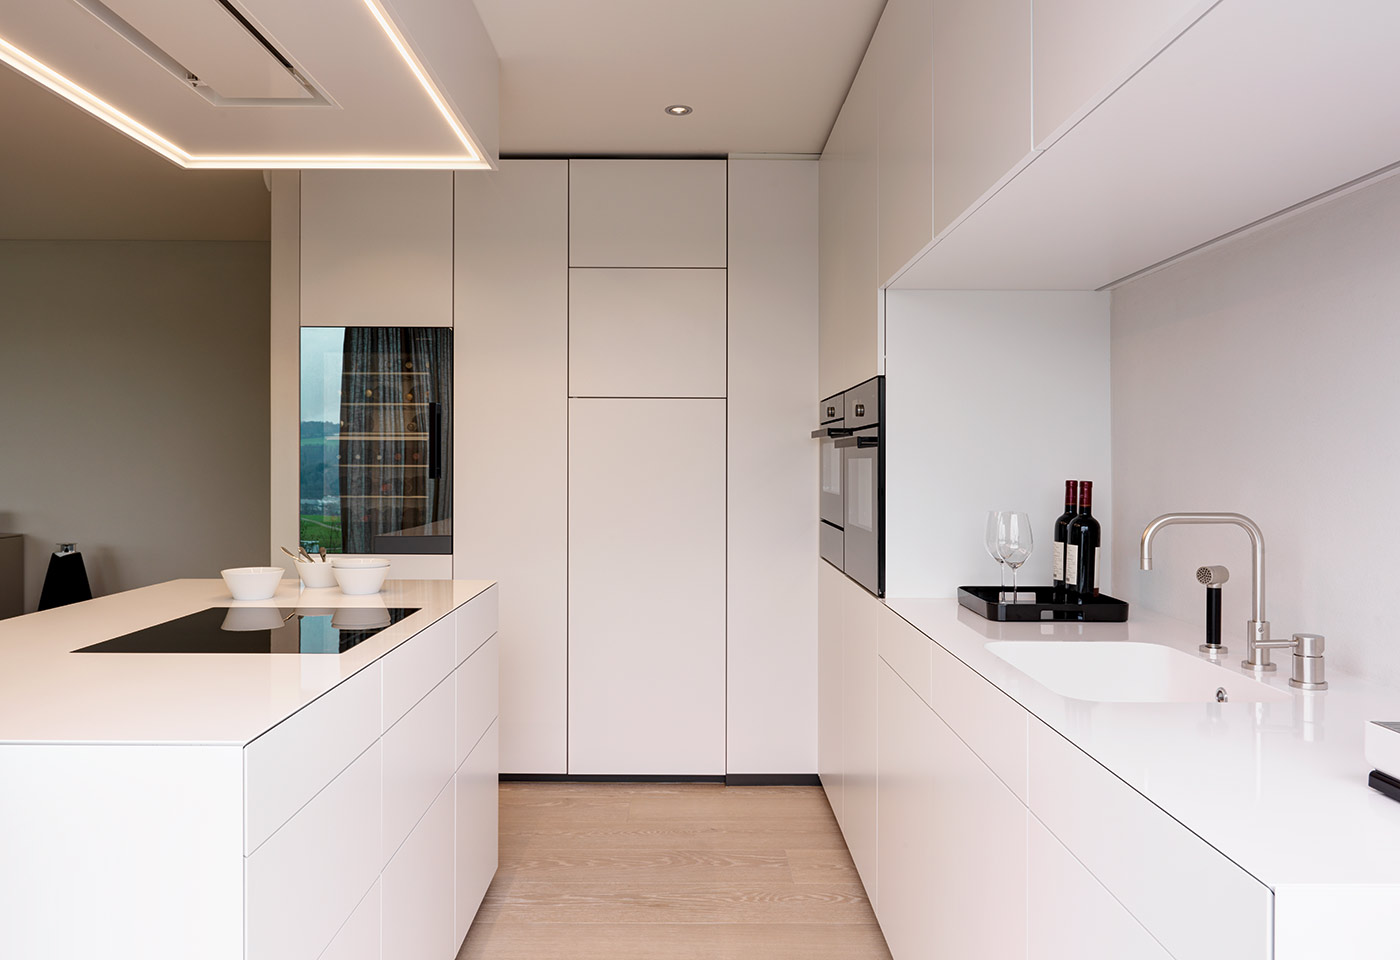 k che bronze wei offene k che zementfliesen spritzschutz 90x70 mit kochinsel abverkauf. Black Bedroom Furniture Sets. Home Design Ideas